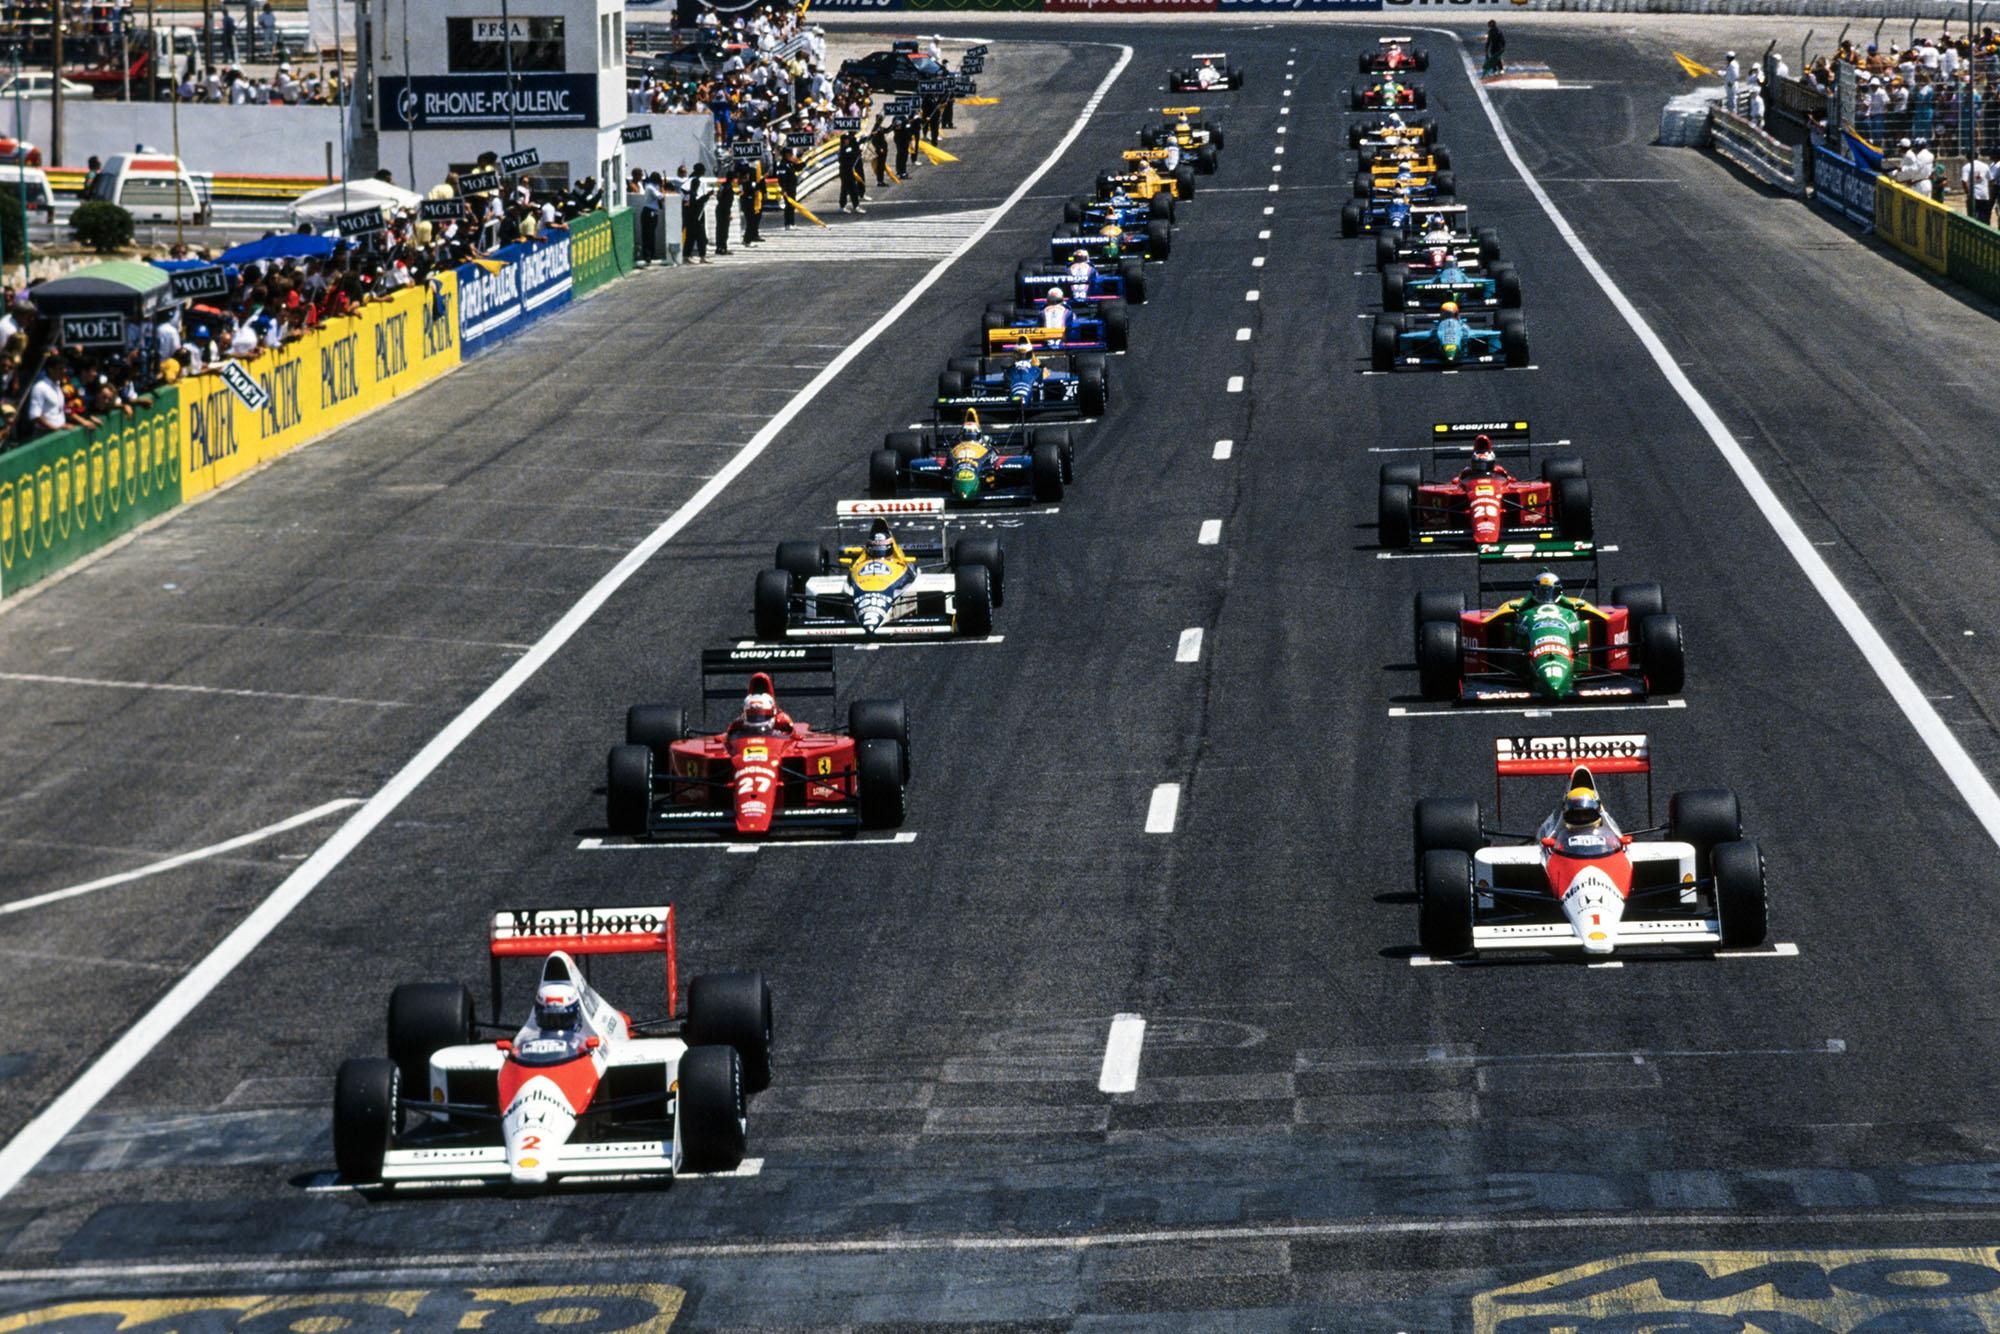 1989 French GP start